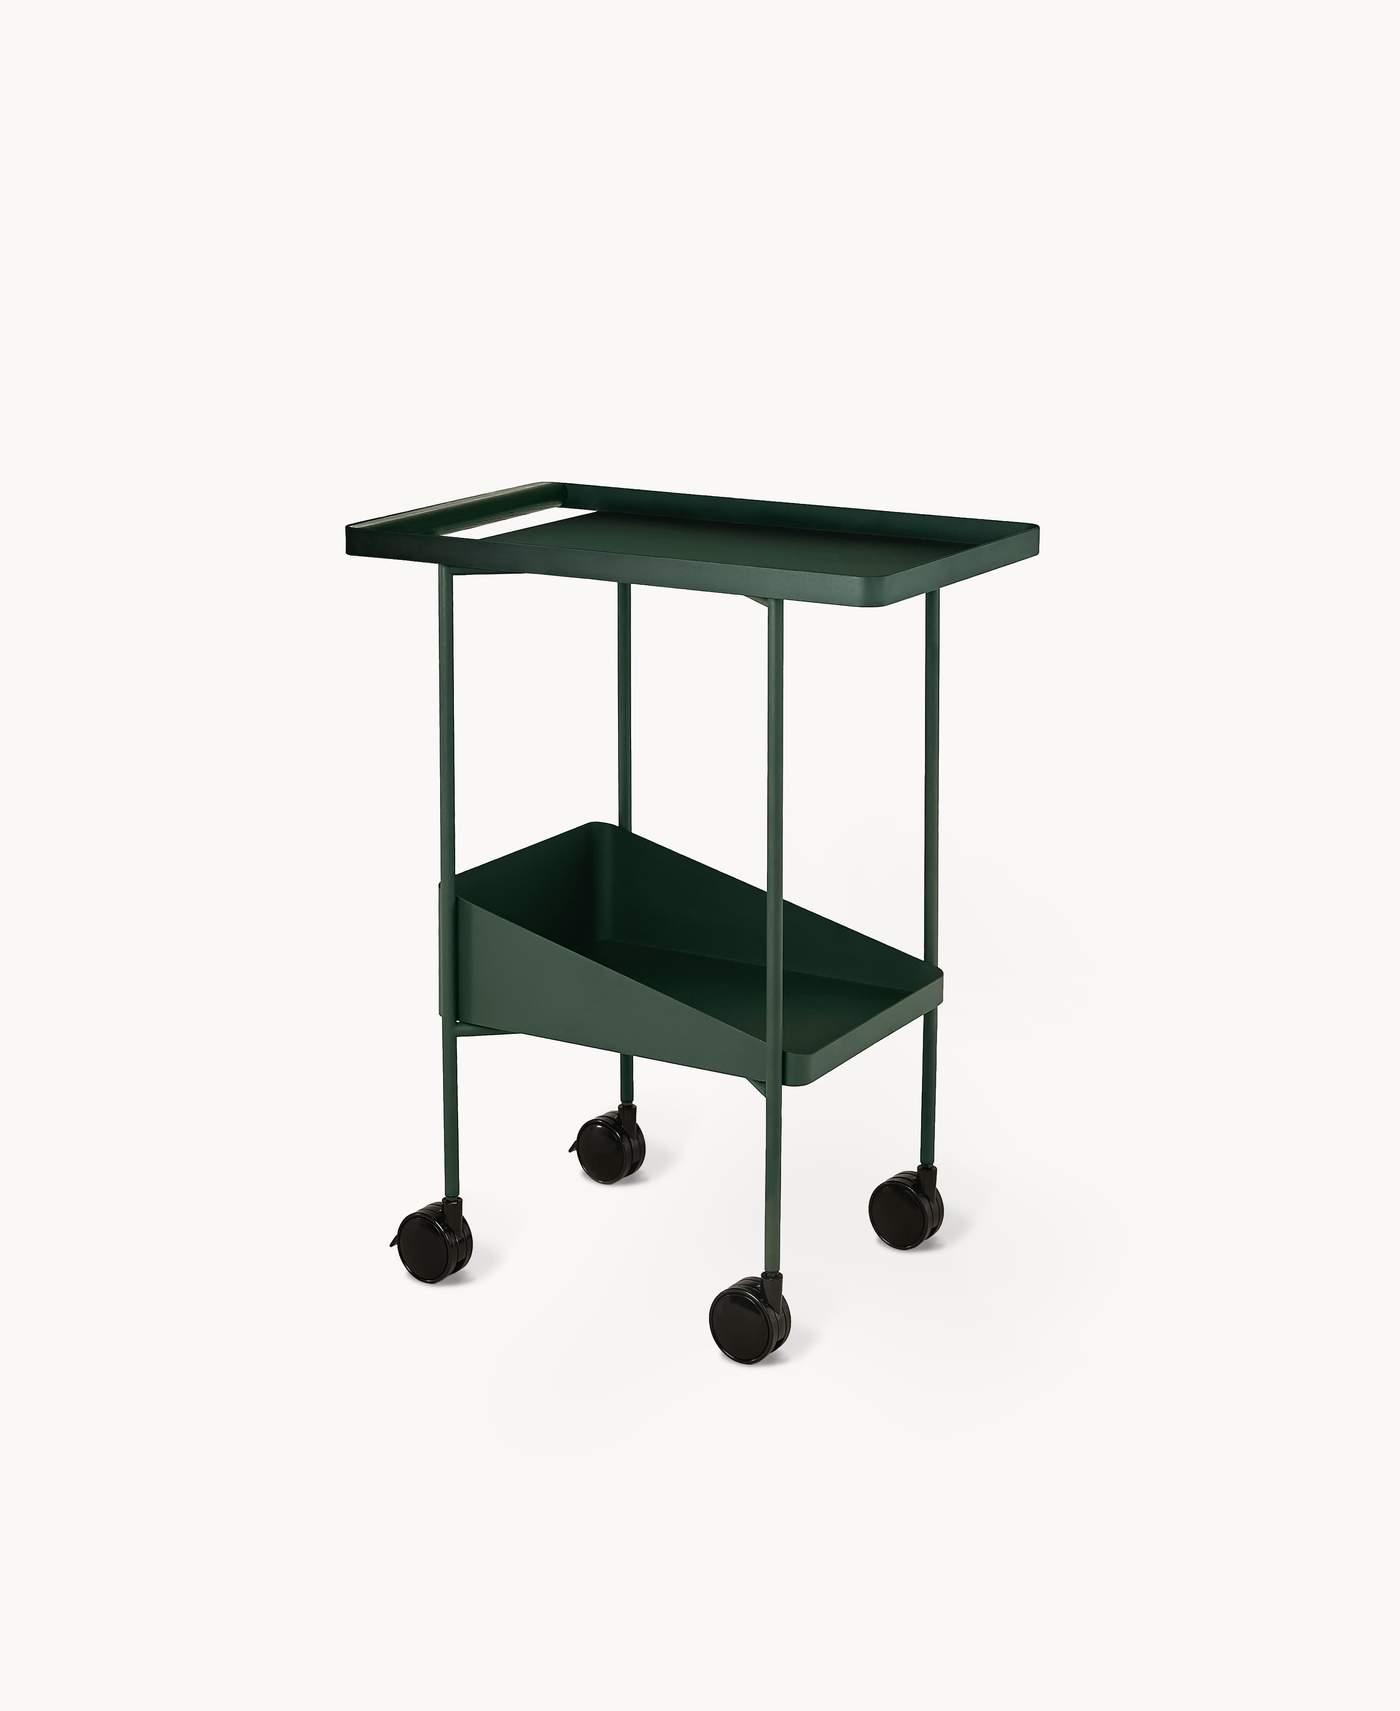 barbican-trolley-green-angle-pdp_fcb7d0e6-f2c5-4b70-a8cd-6394c0da1410_1400x